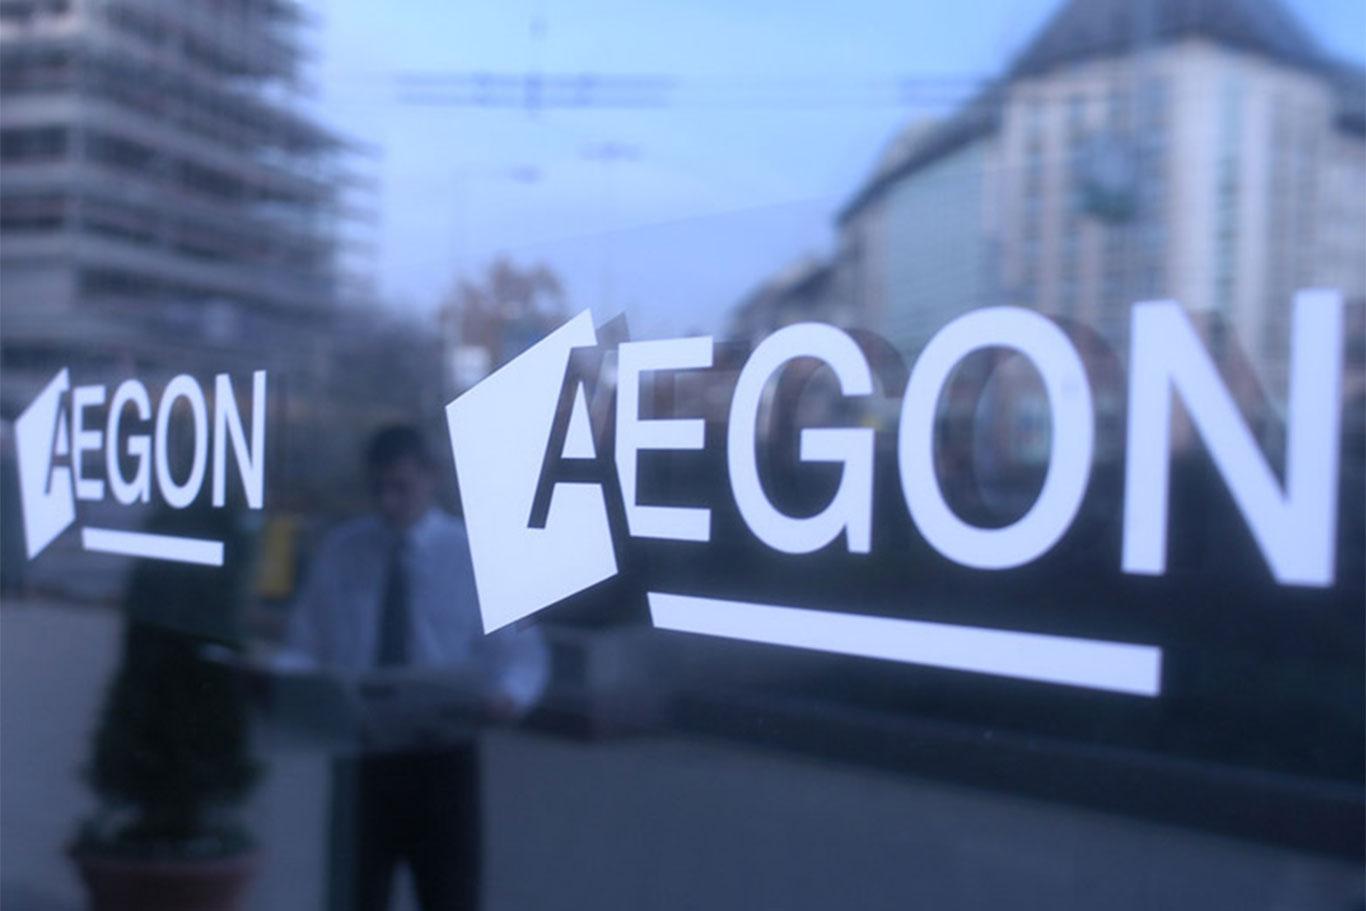 AEGON CONFIANZA INTERNACIONAL